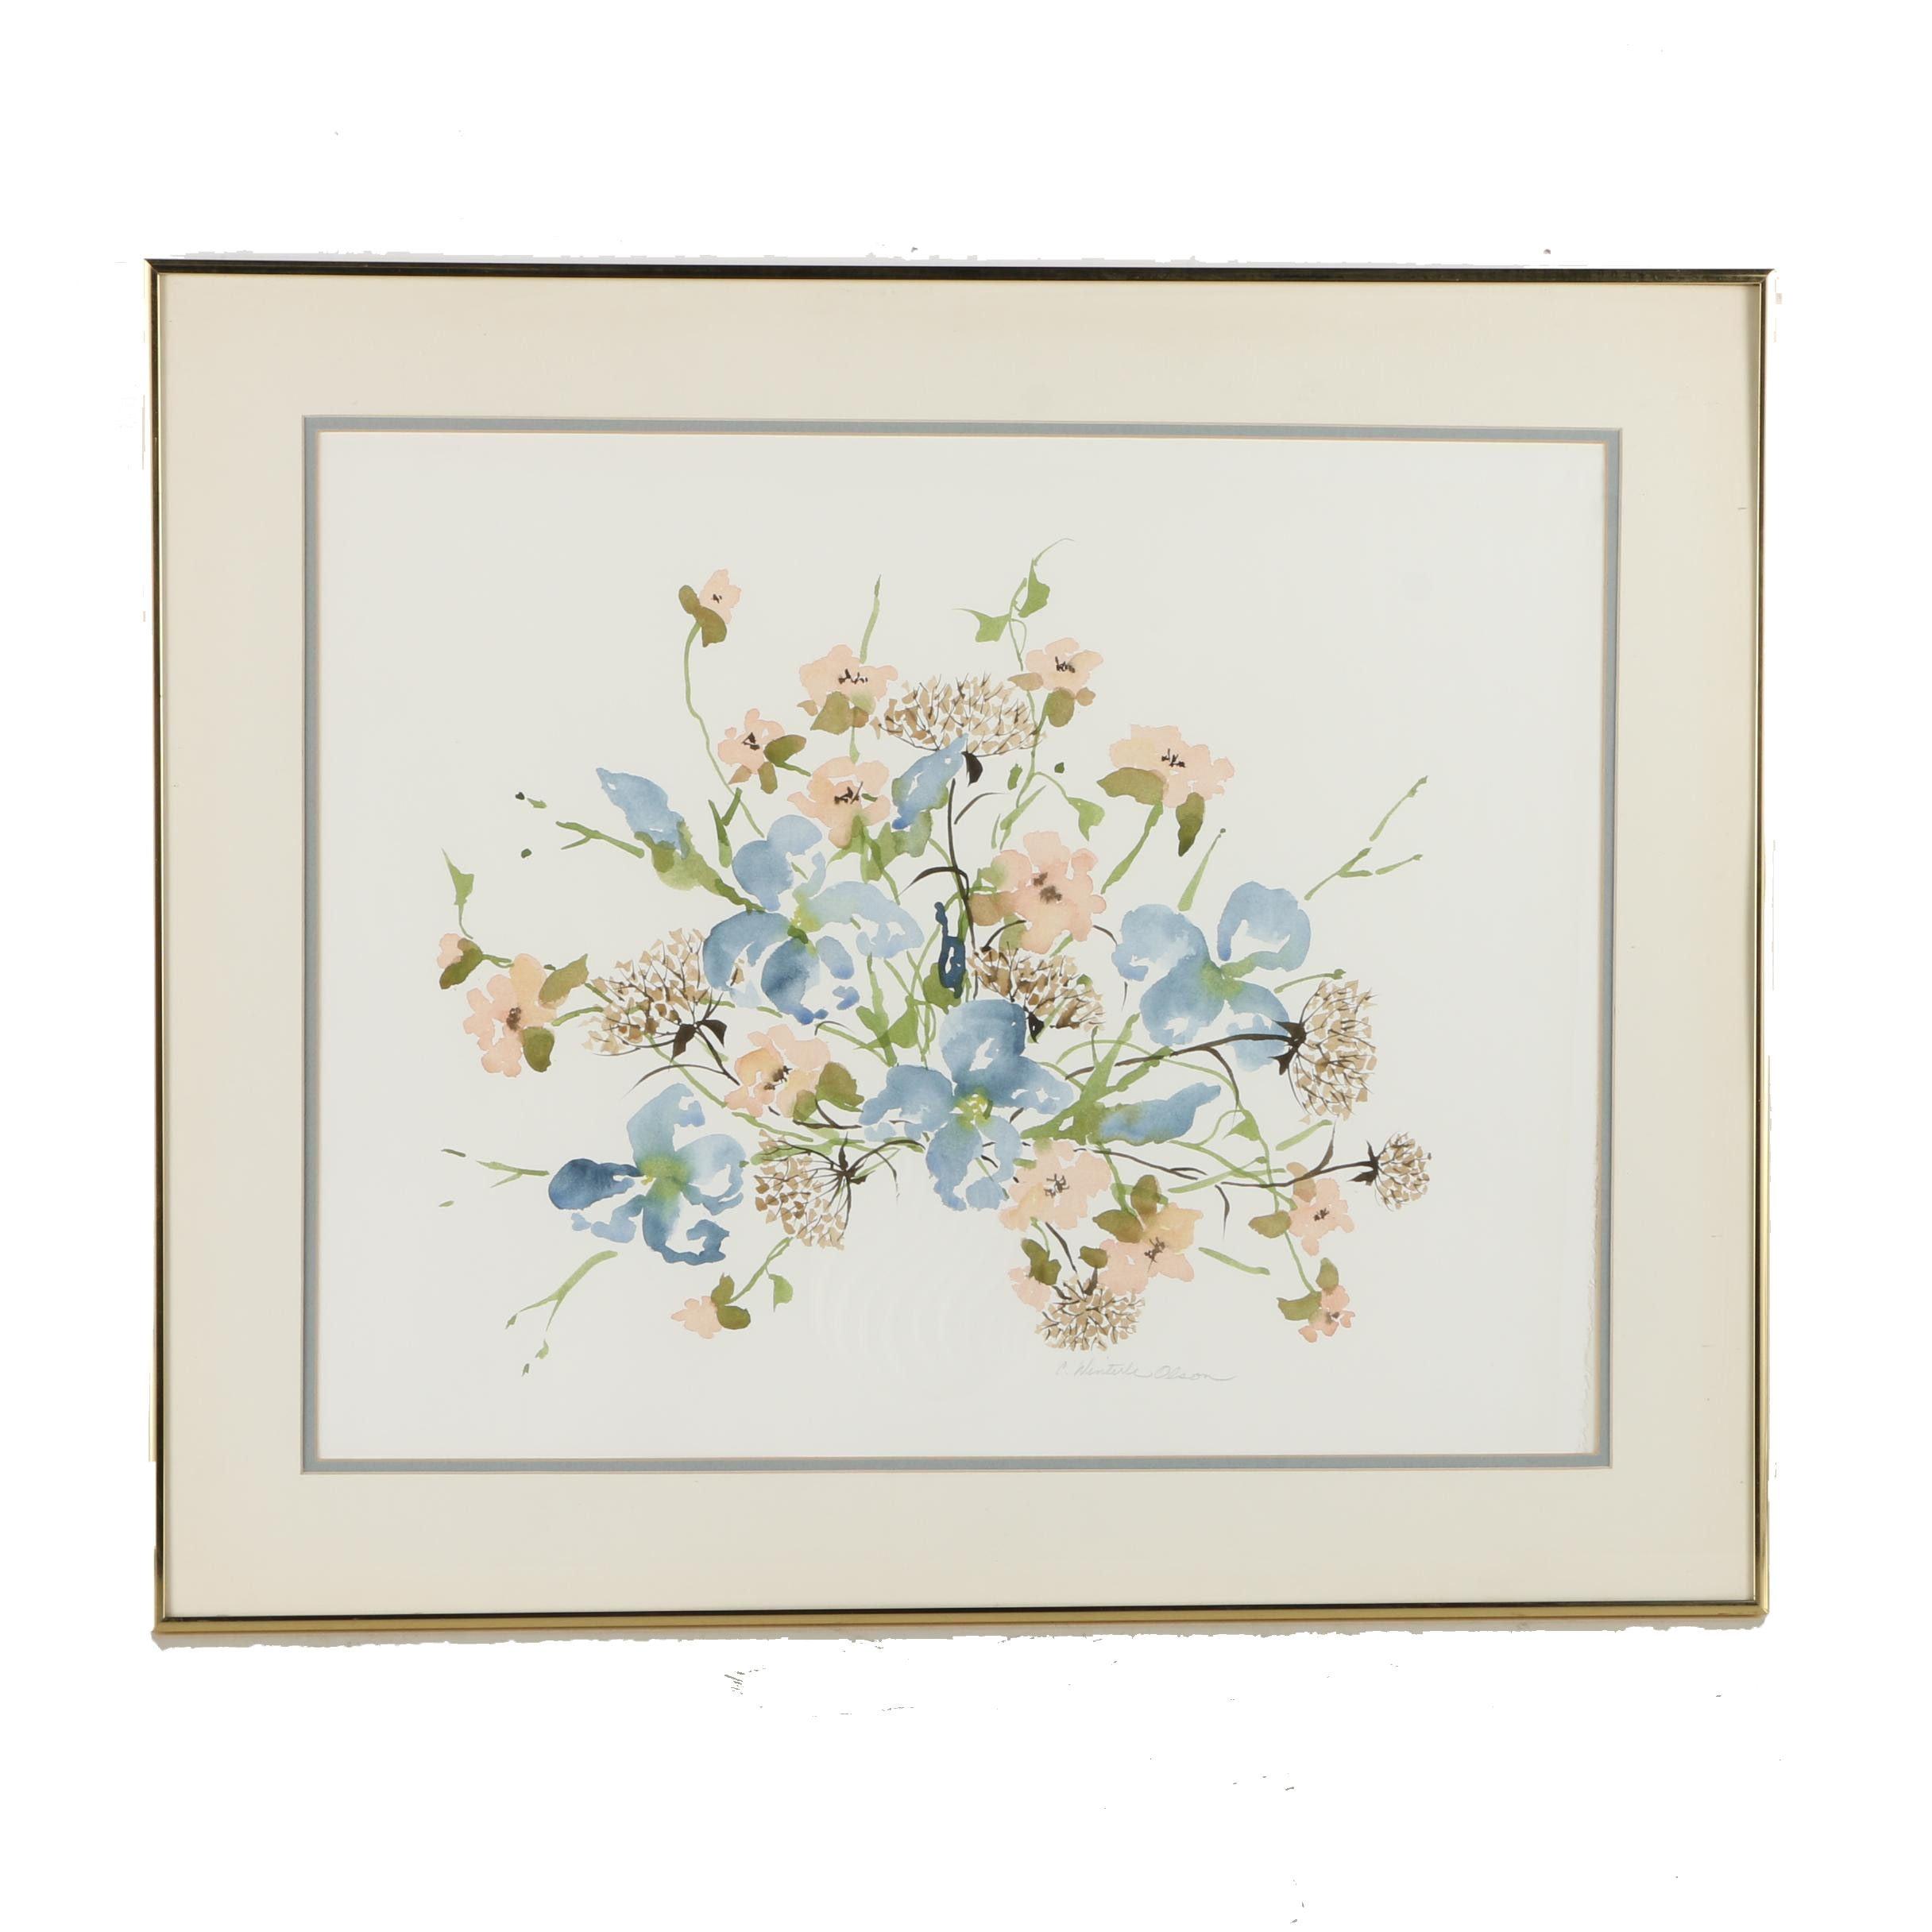 Charlene Winter Olson Embossed Watercolor Painting on Paper of Flowers